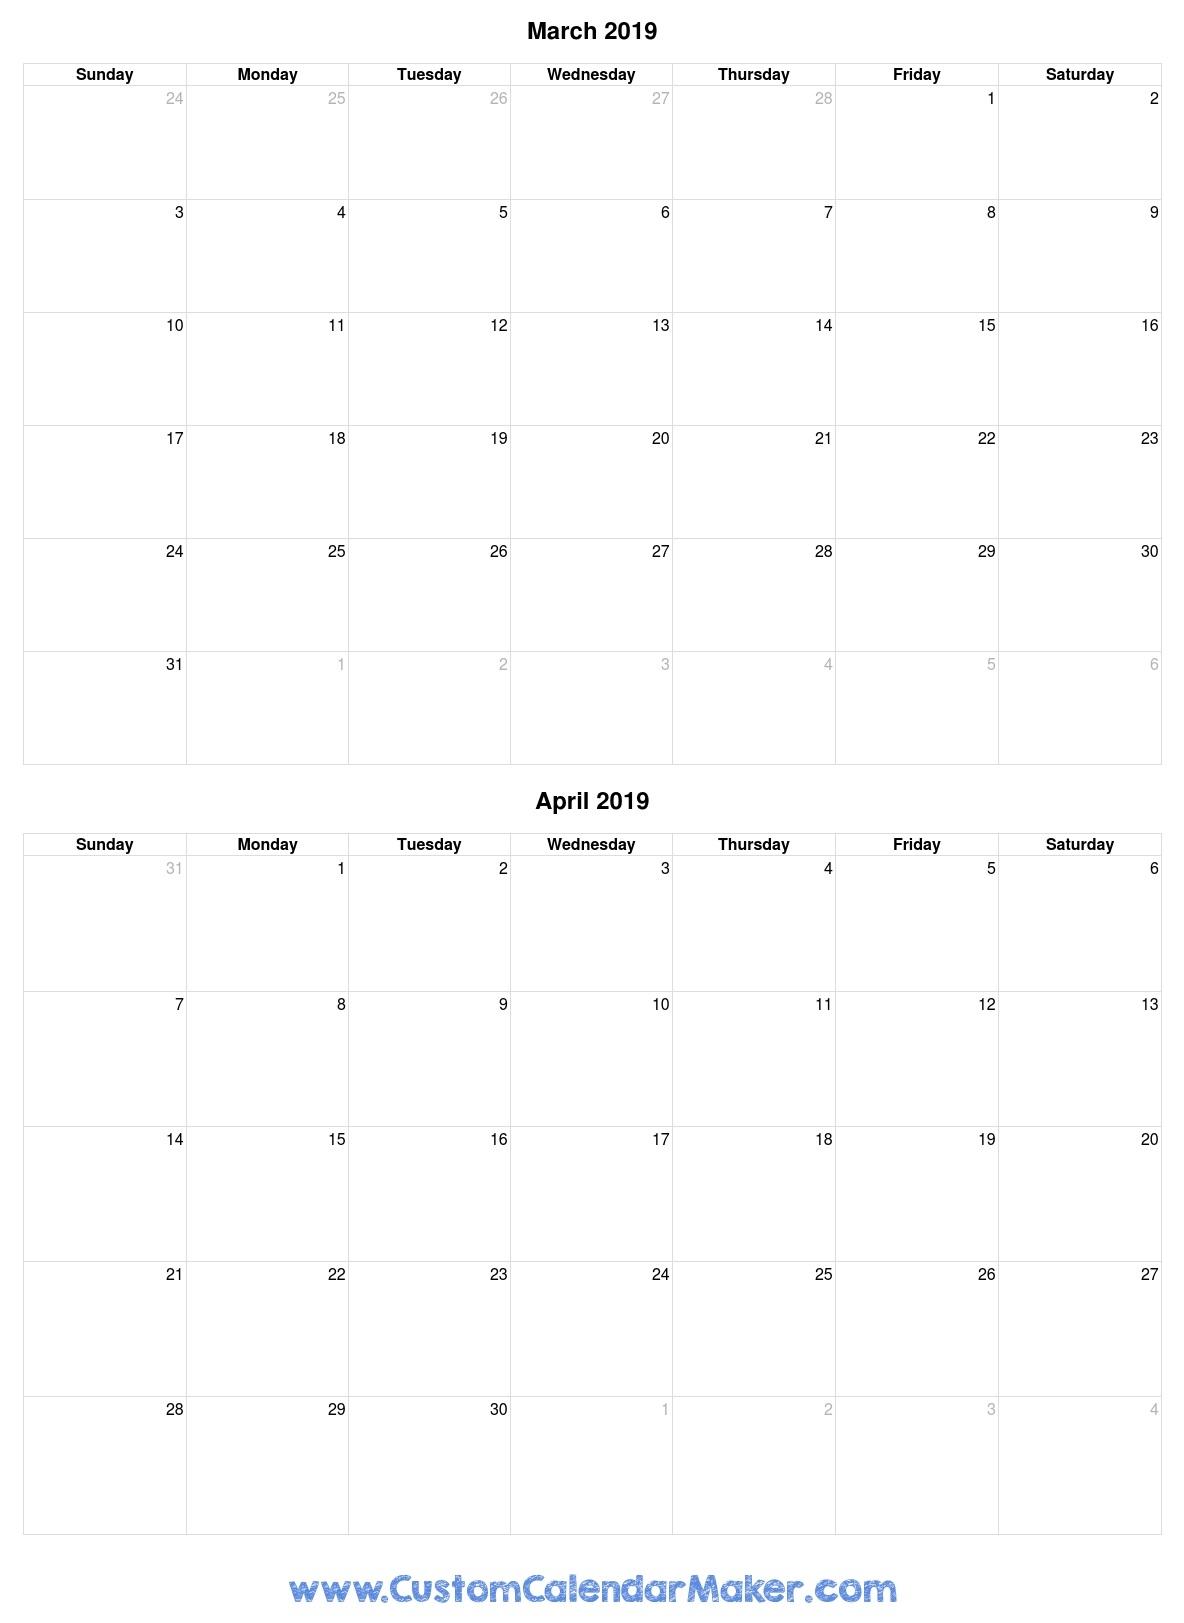 Free Printable Calendars Blank Pdf Templates To Print A 2019 Calendar